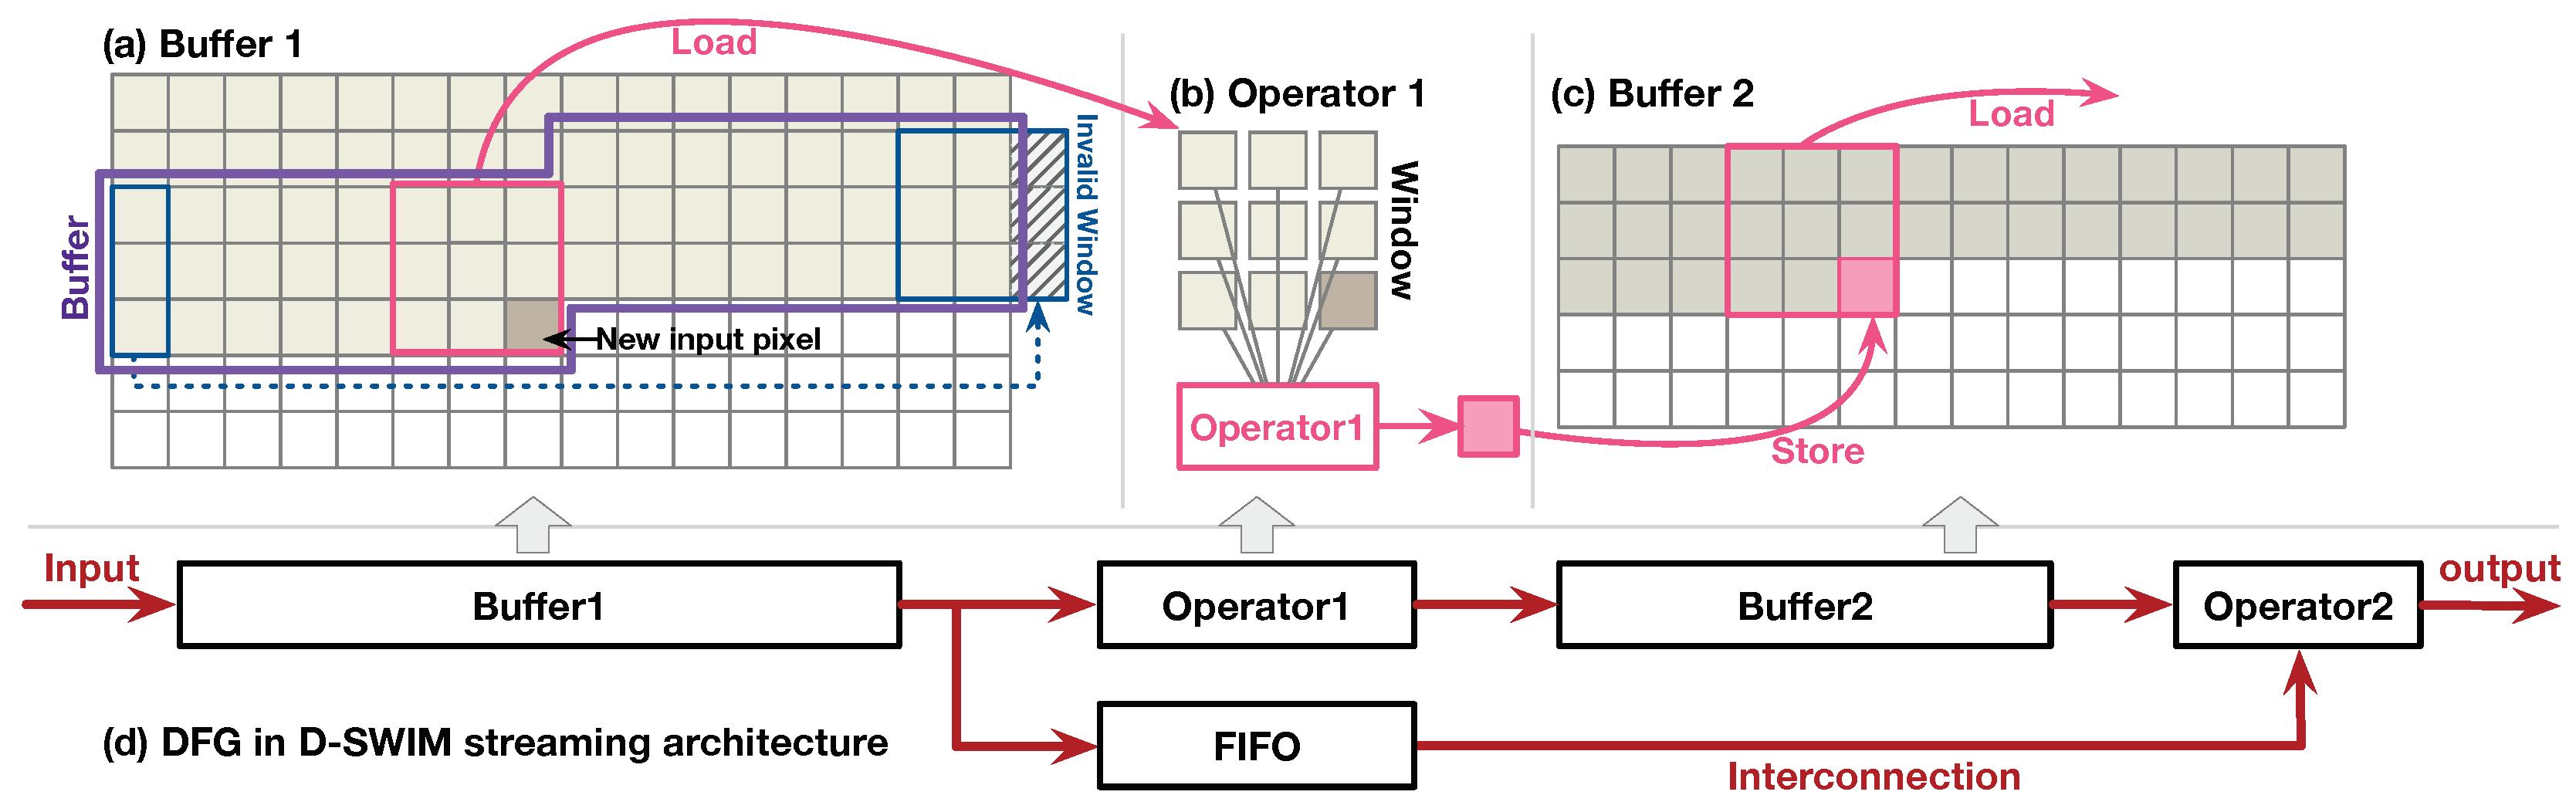 J  Imaging | Free Full-Text | High-Throughput Line Buffer